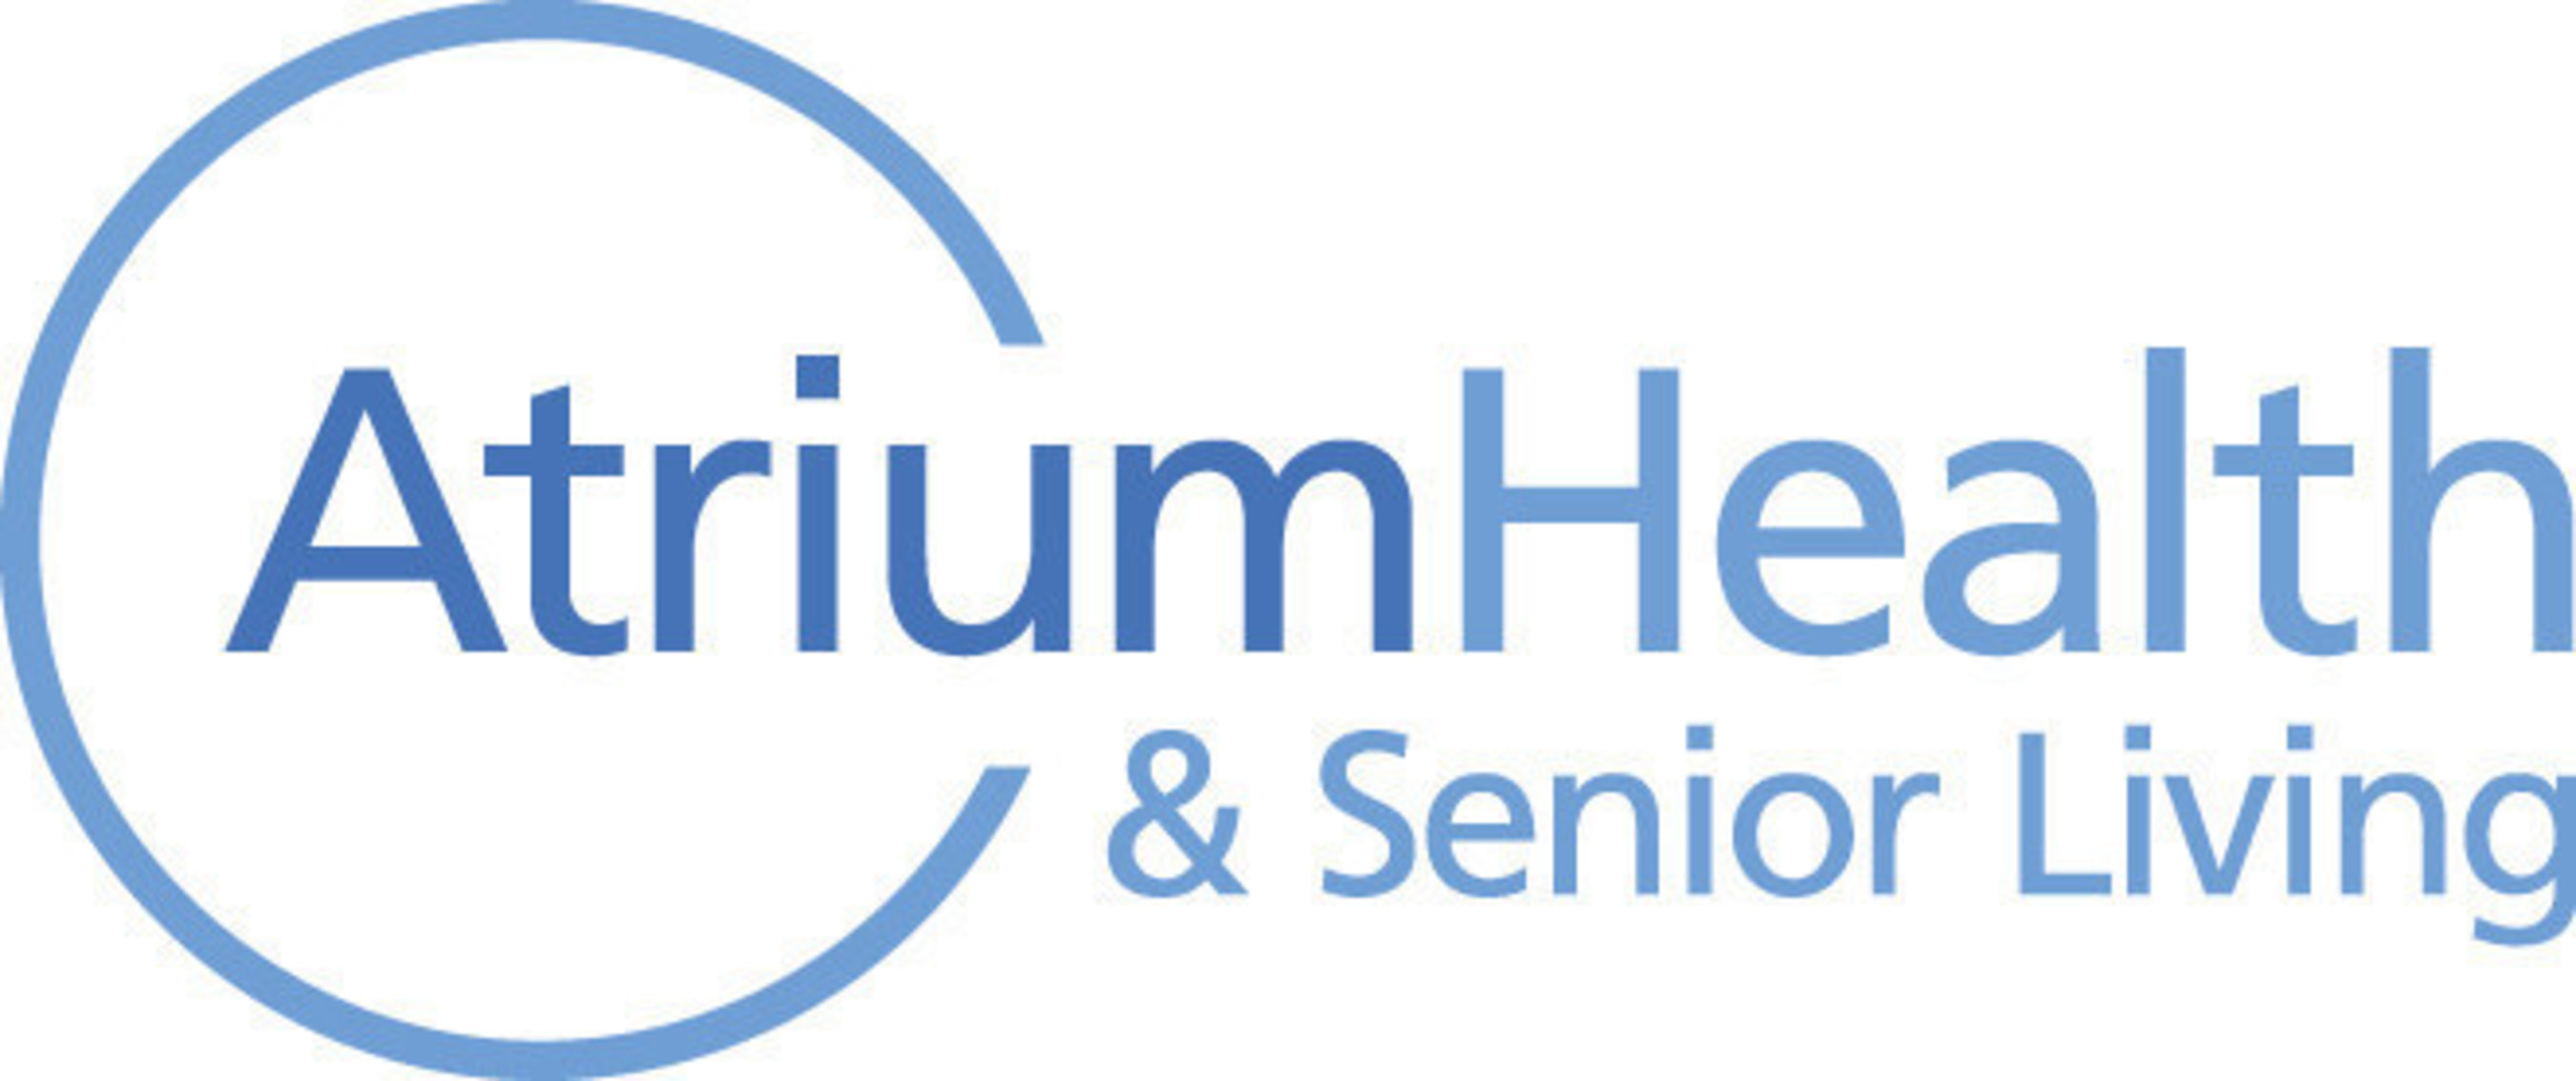 Atrium Health & Senior Living